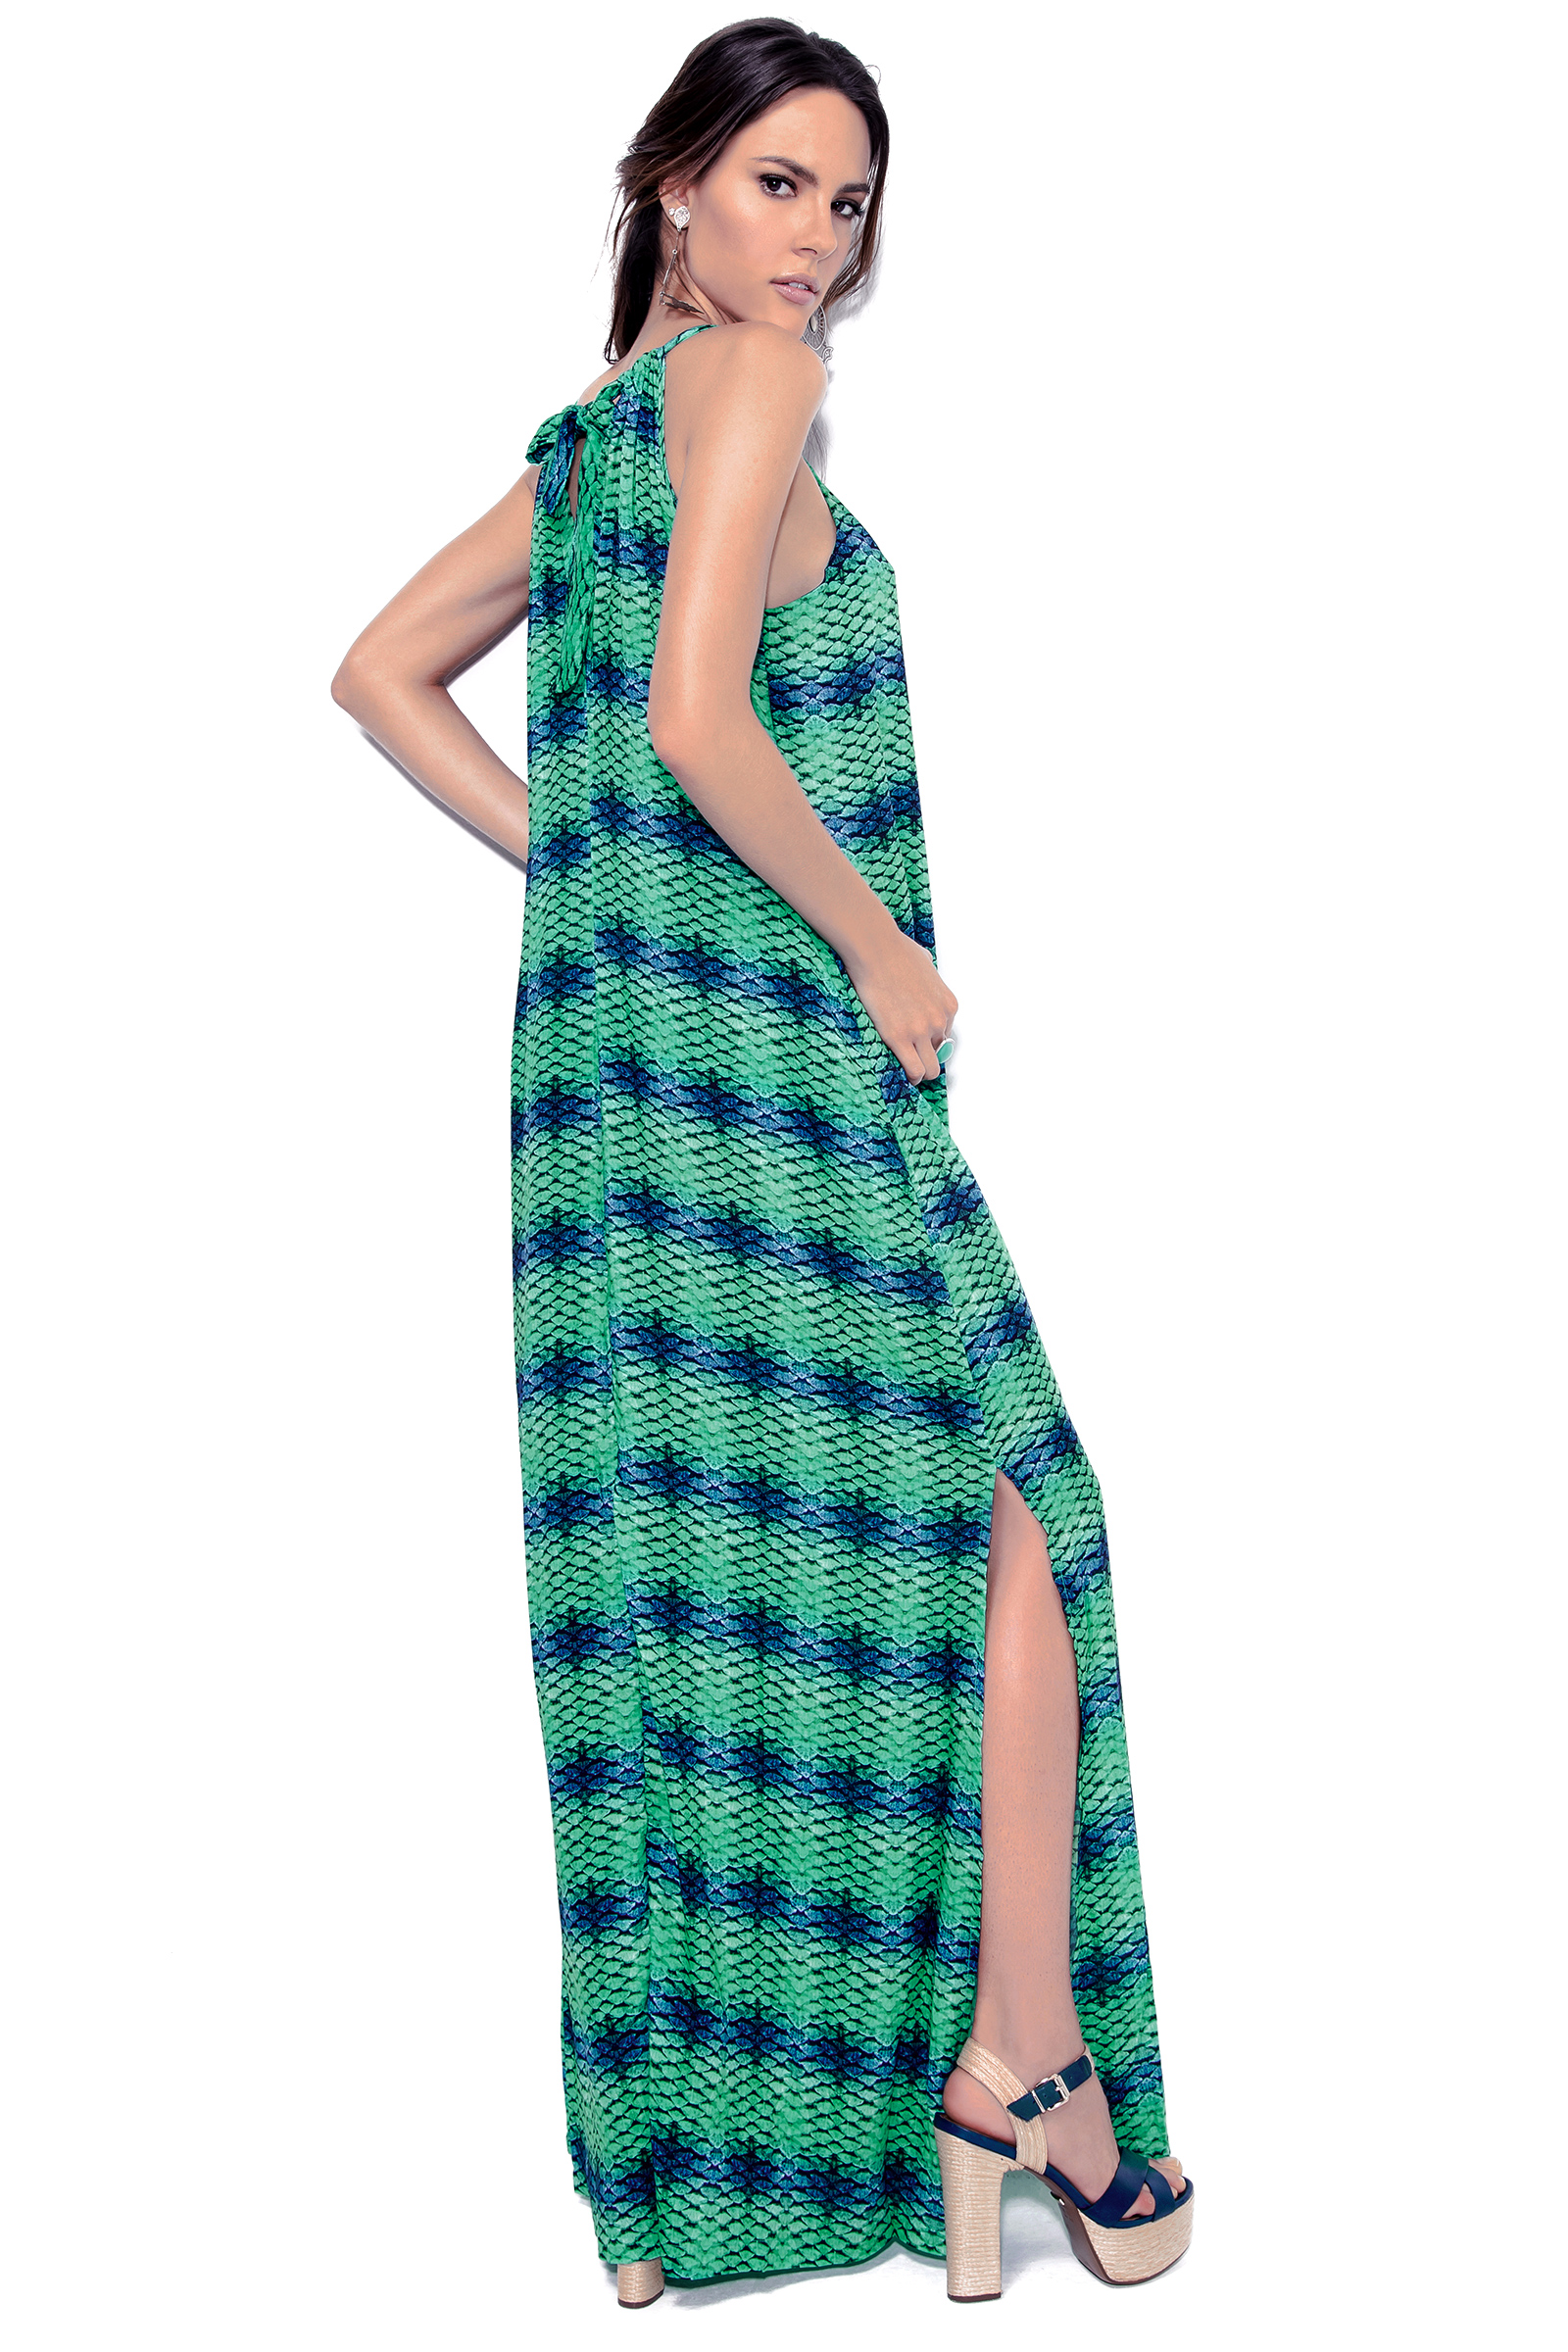 d605adb261e0 ... Lang kjole med slids i blåt og grønt mønster - DRESS ESCAMAS AQUA ...